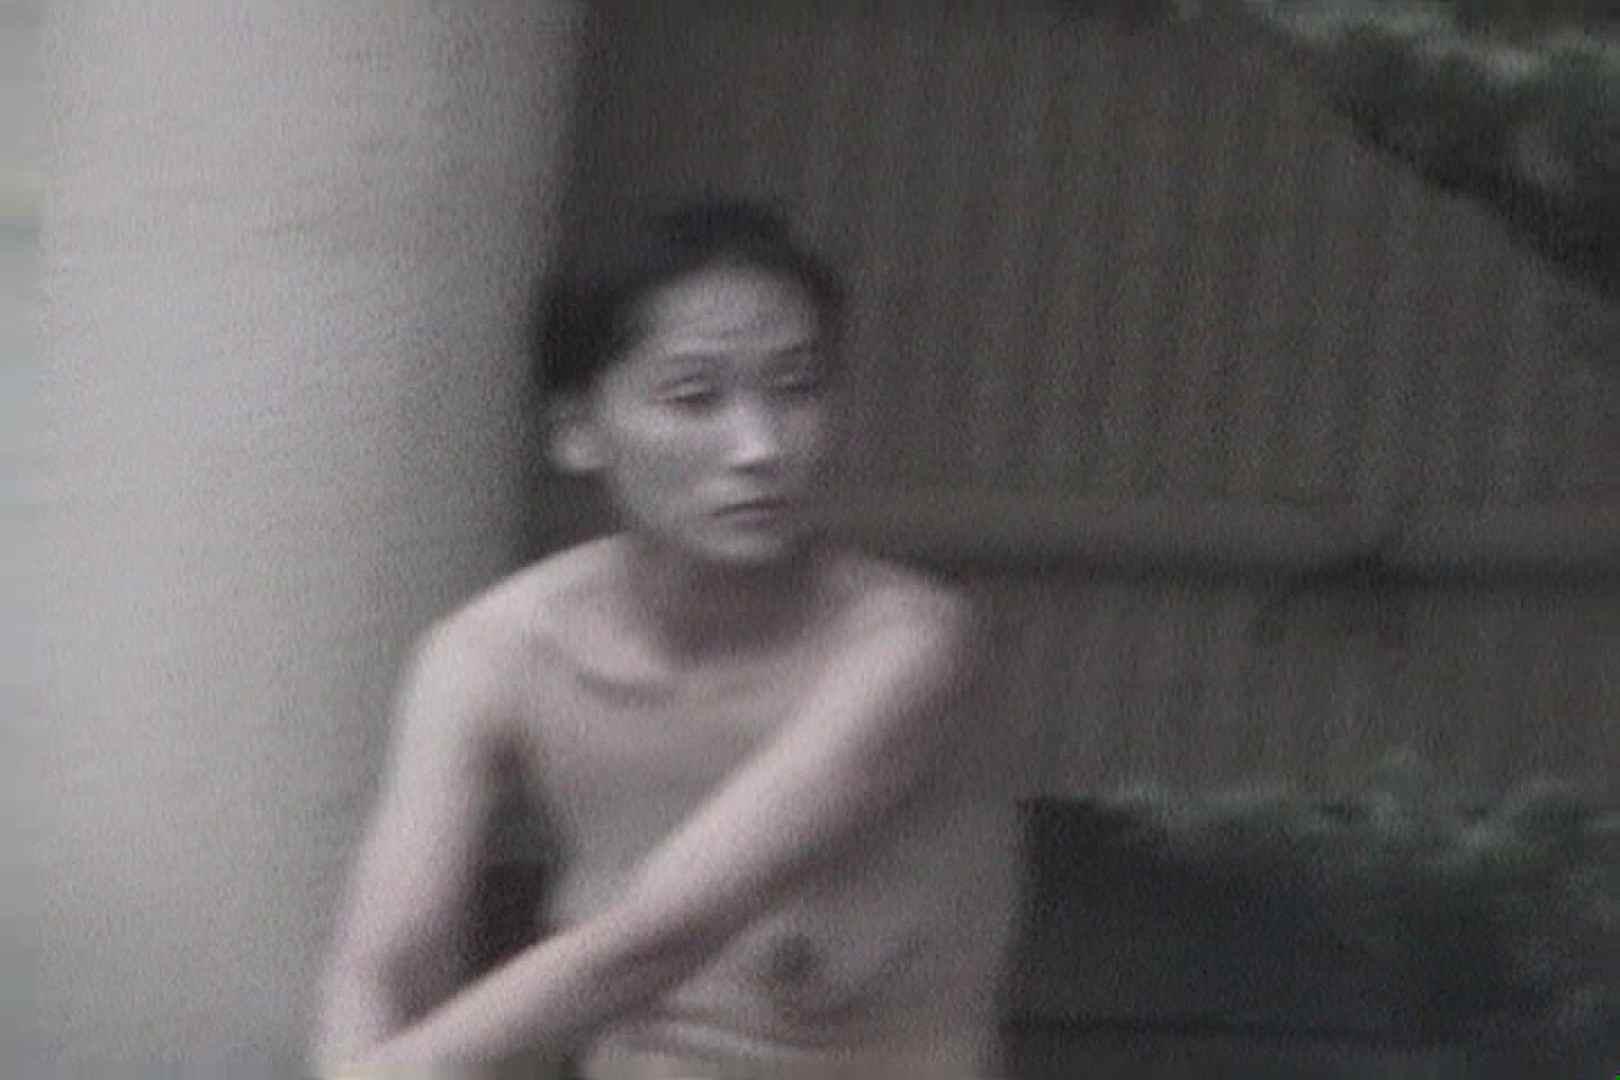 Aquaな露天風呂Vol.557 露天 われめAV動画紹介 78枚 44